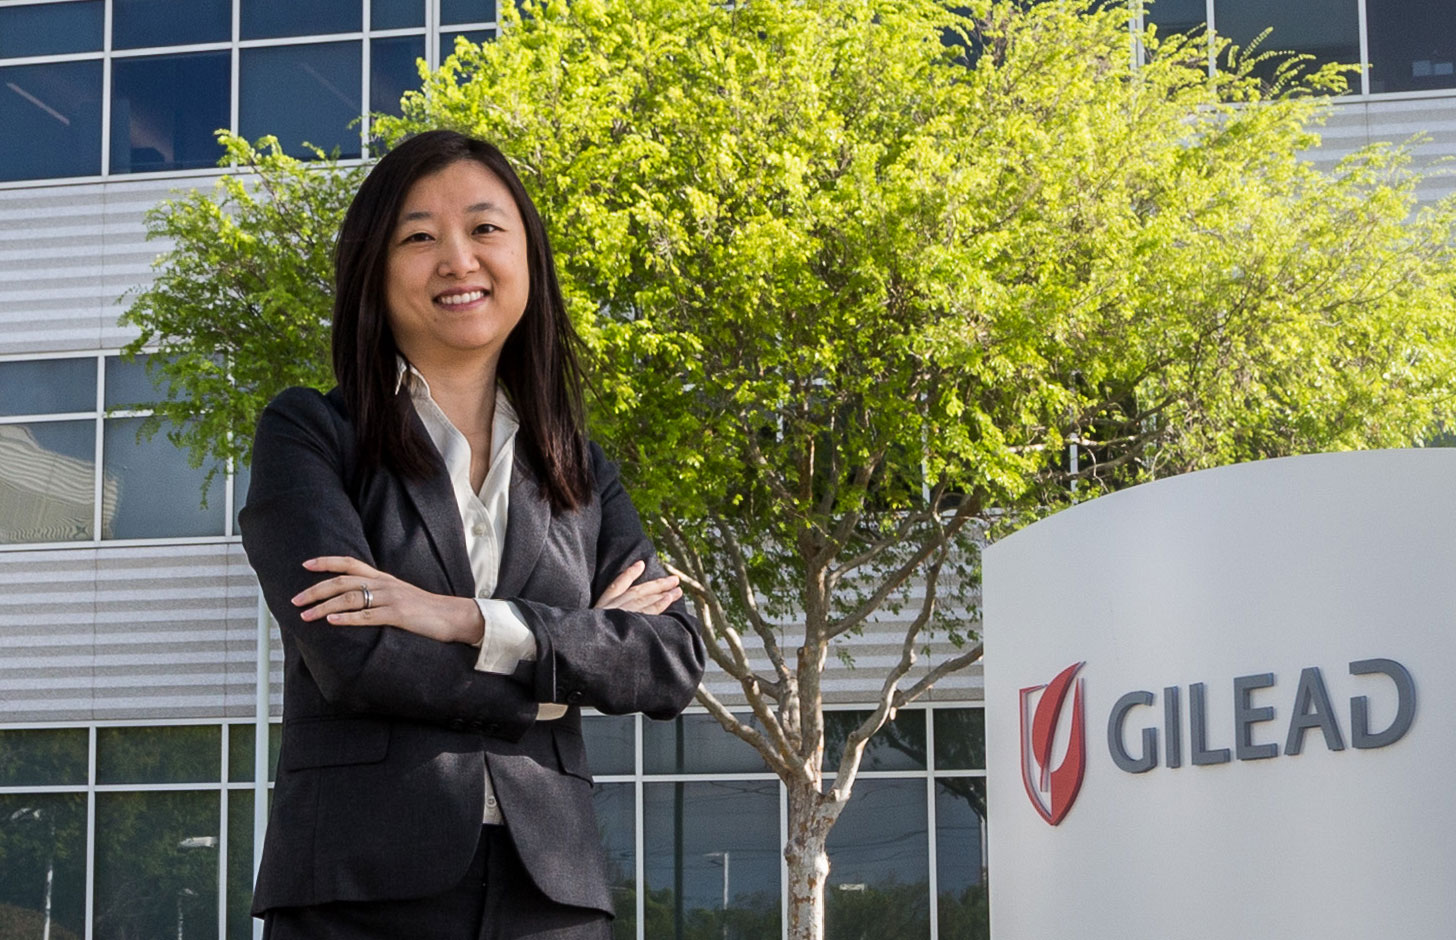 Berkeley evening and weekend MBA student Alicea Wu